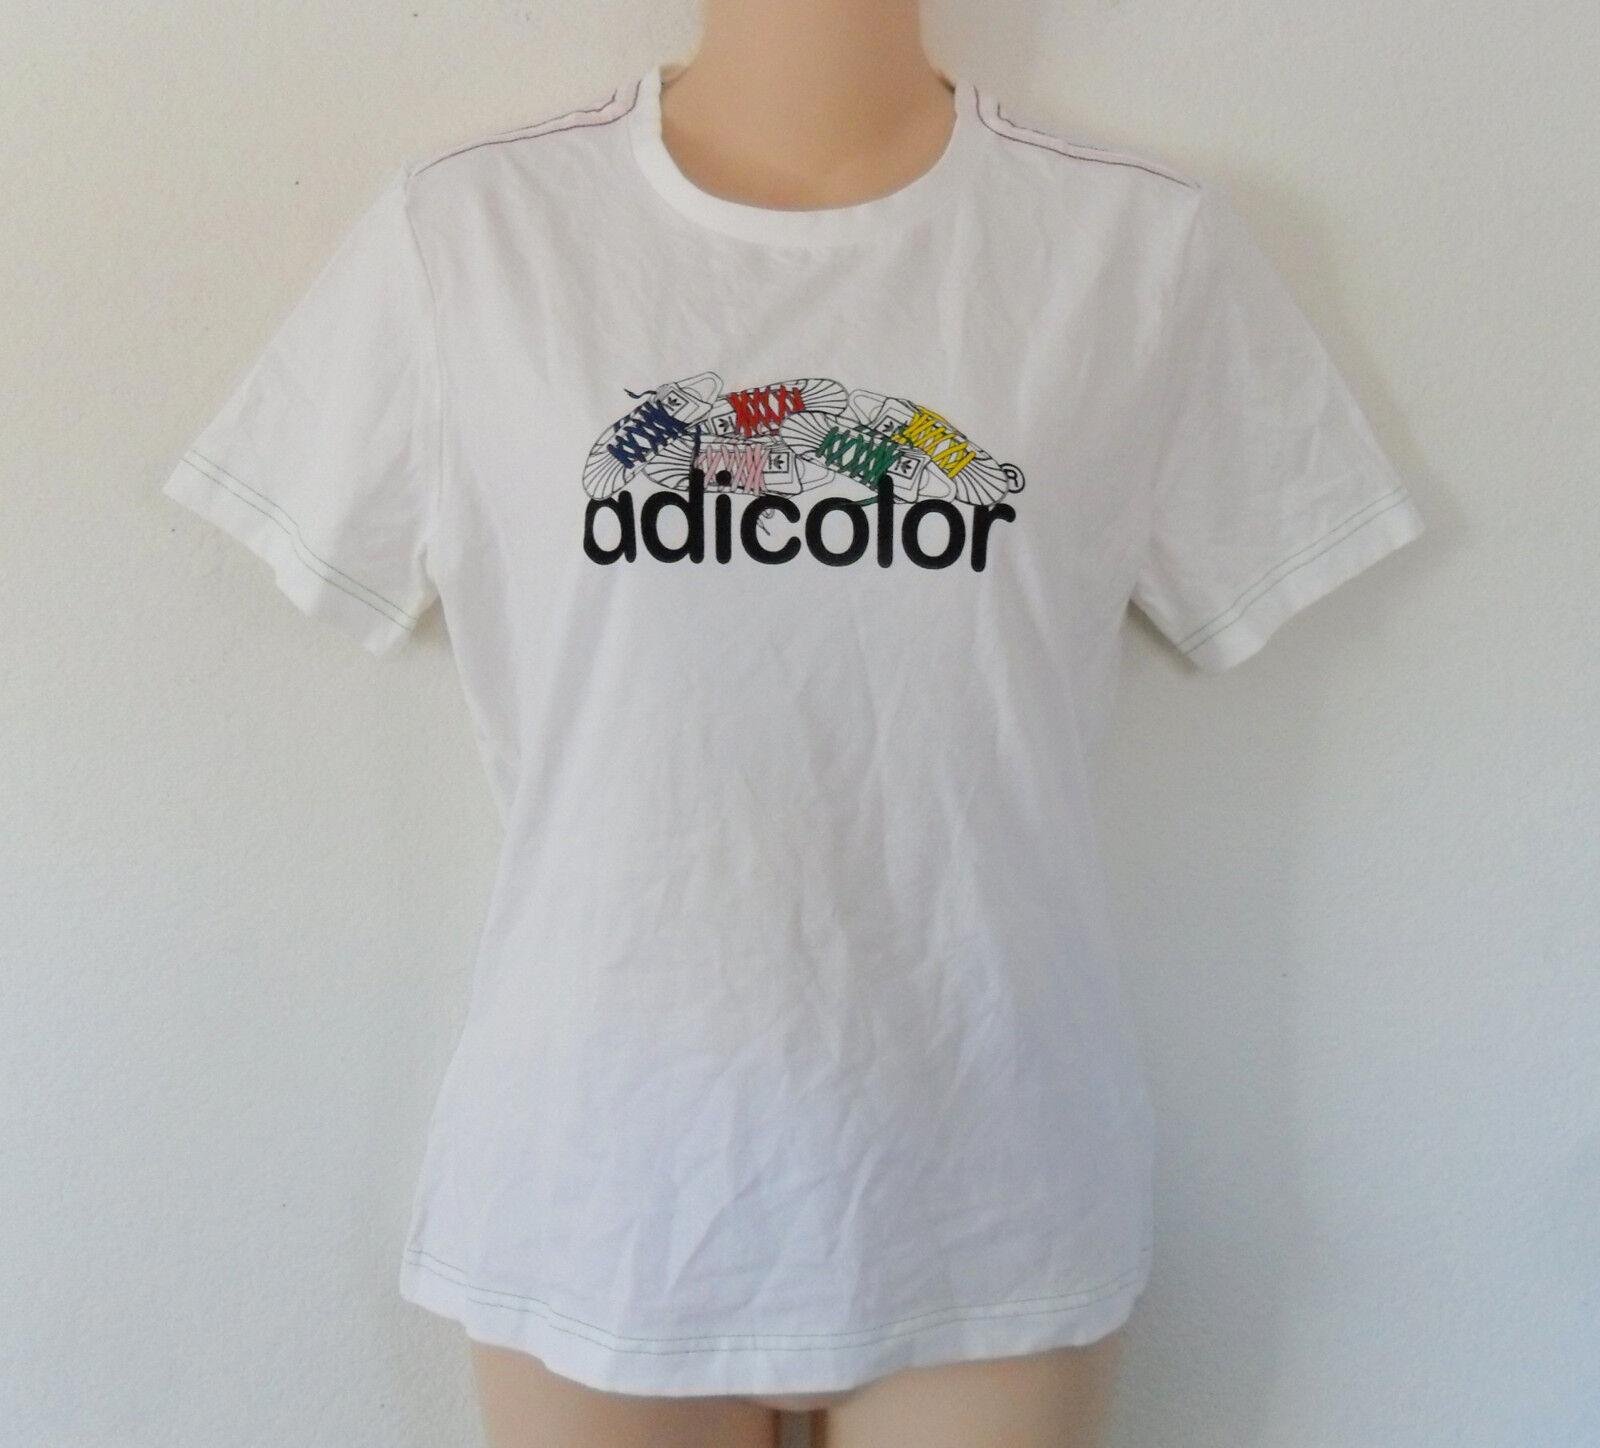 quality design d4d68 86ad4 Limited Ed adidas Adicolor W5 & Bk5 Superstar Graphic Tee T-shirt Top Women  Sz M